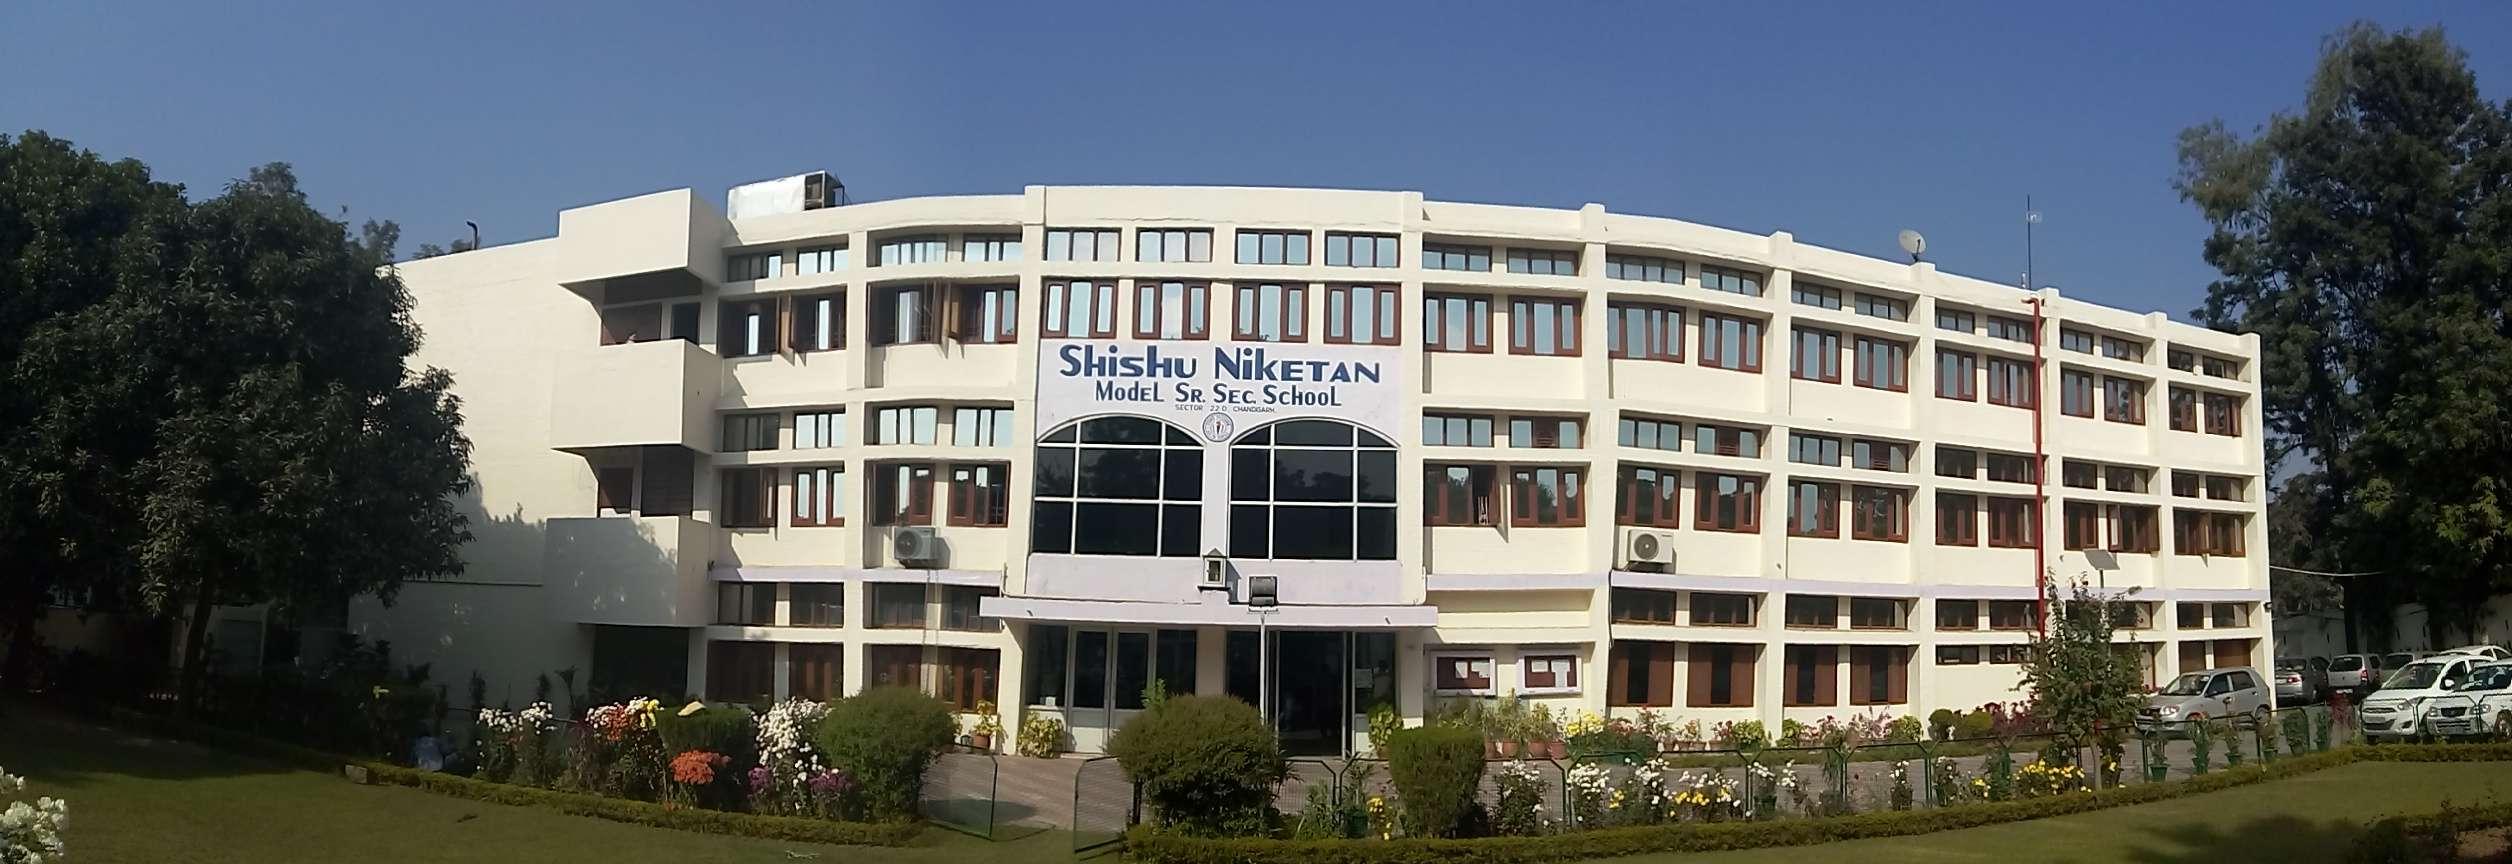 SHISHU NIKETAN MODEL SR SEC SCHOOL SECTOR 22D CHANDIGARH 2630018